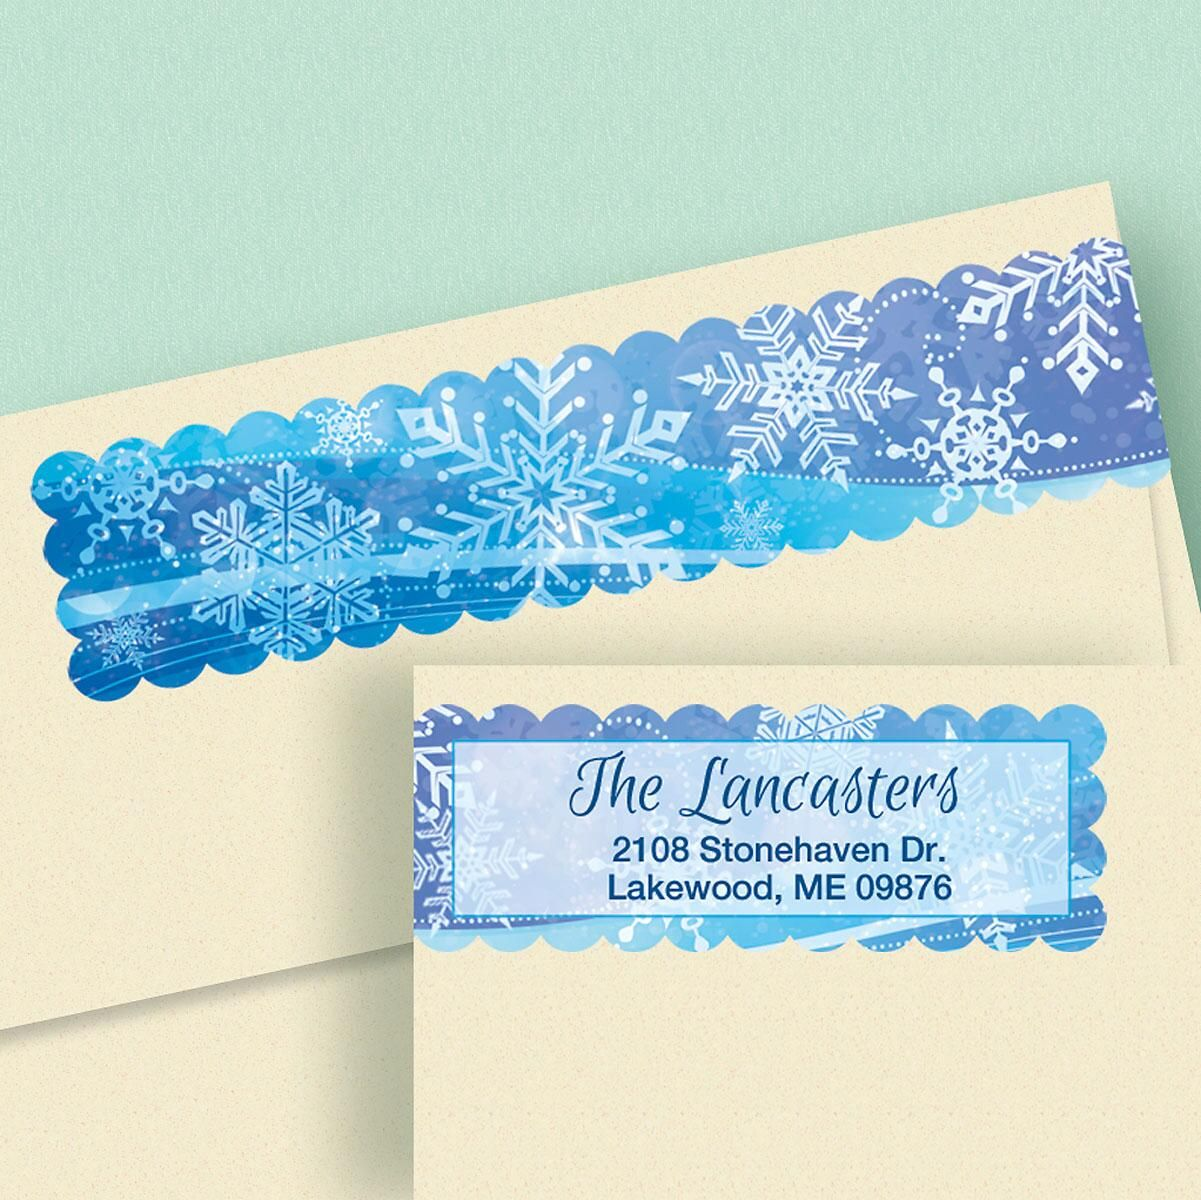 Snowflake Wrap Around Address Labels